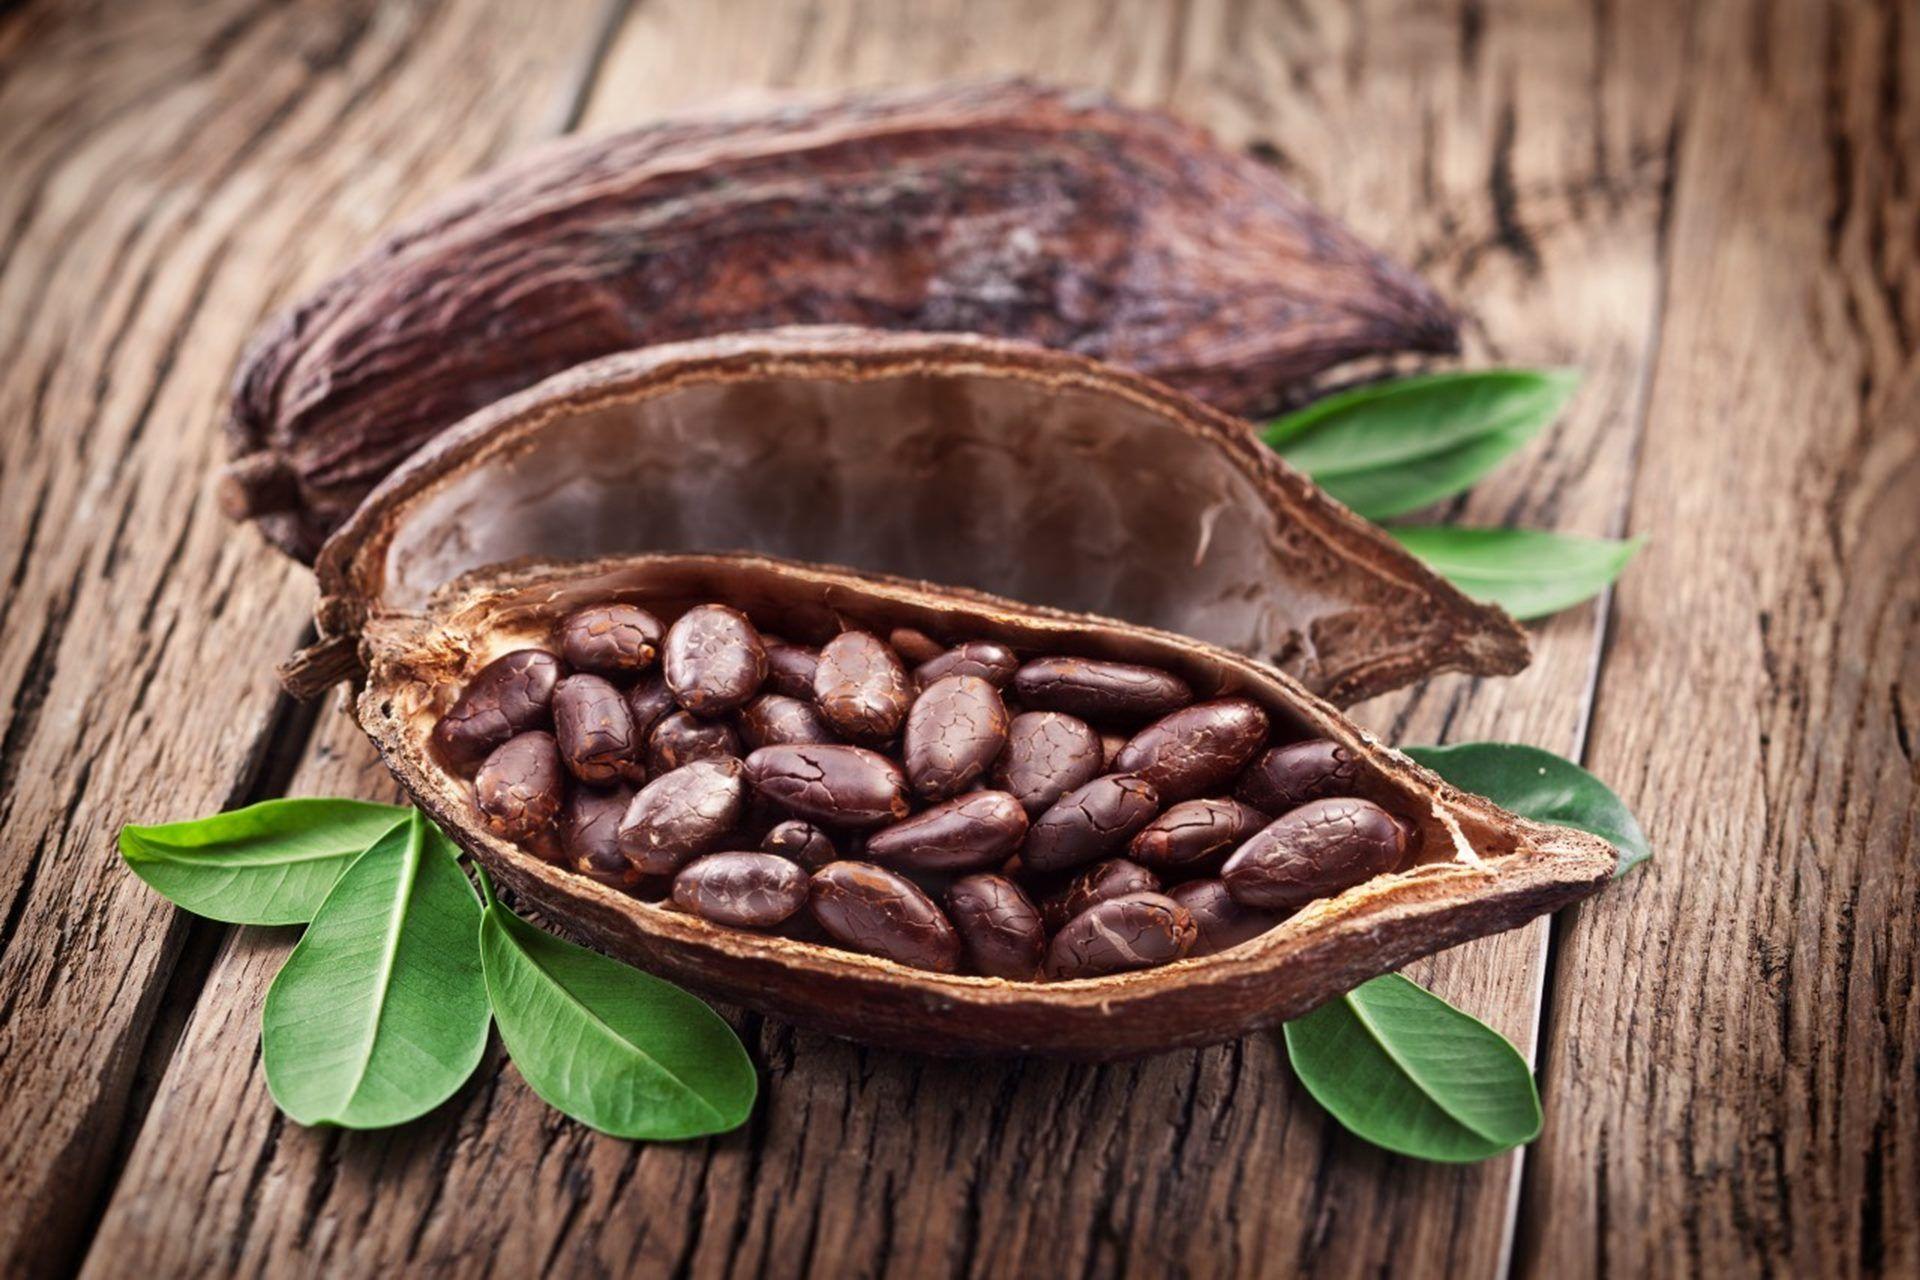 Le Cacao Et Ses Effets Sur La Santé Santé Quotidienne Granos De Cacao Frutas Y Verduras Recetas De Comida